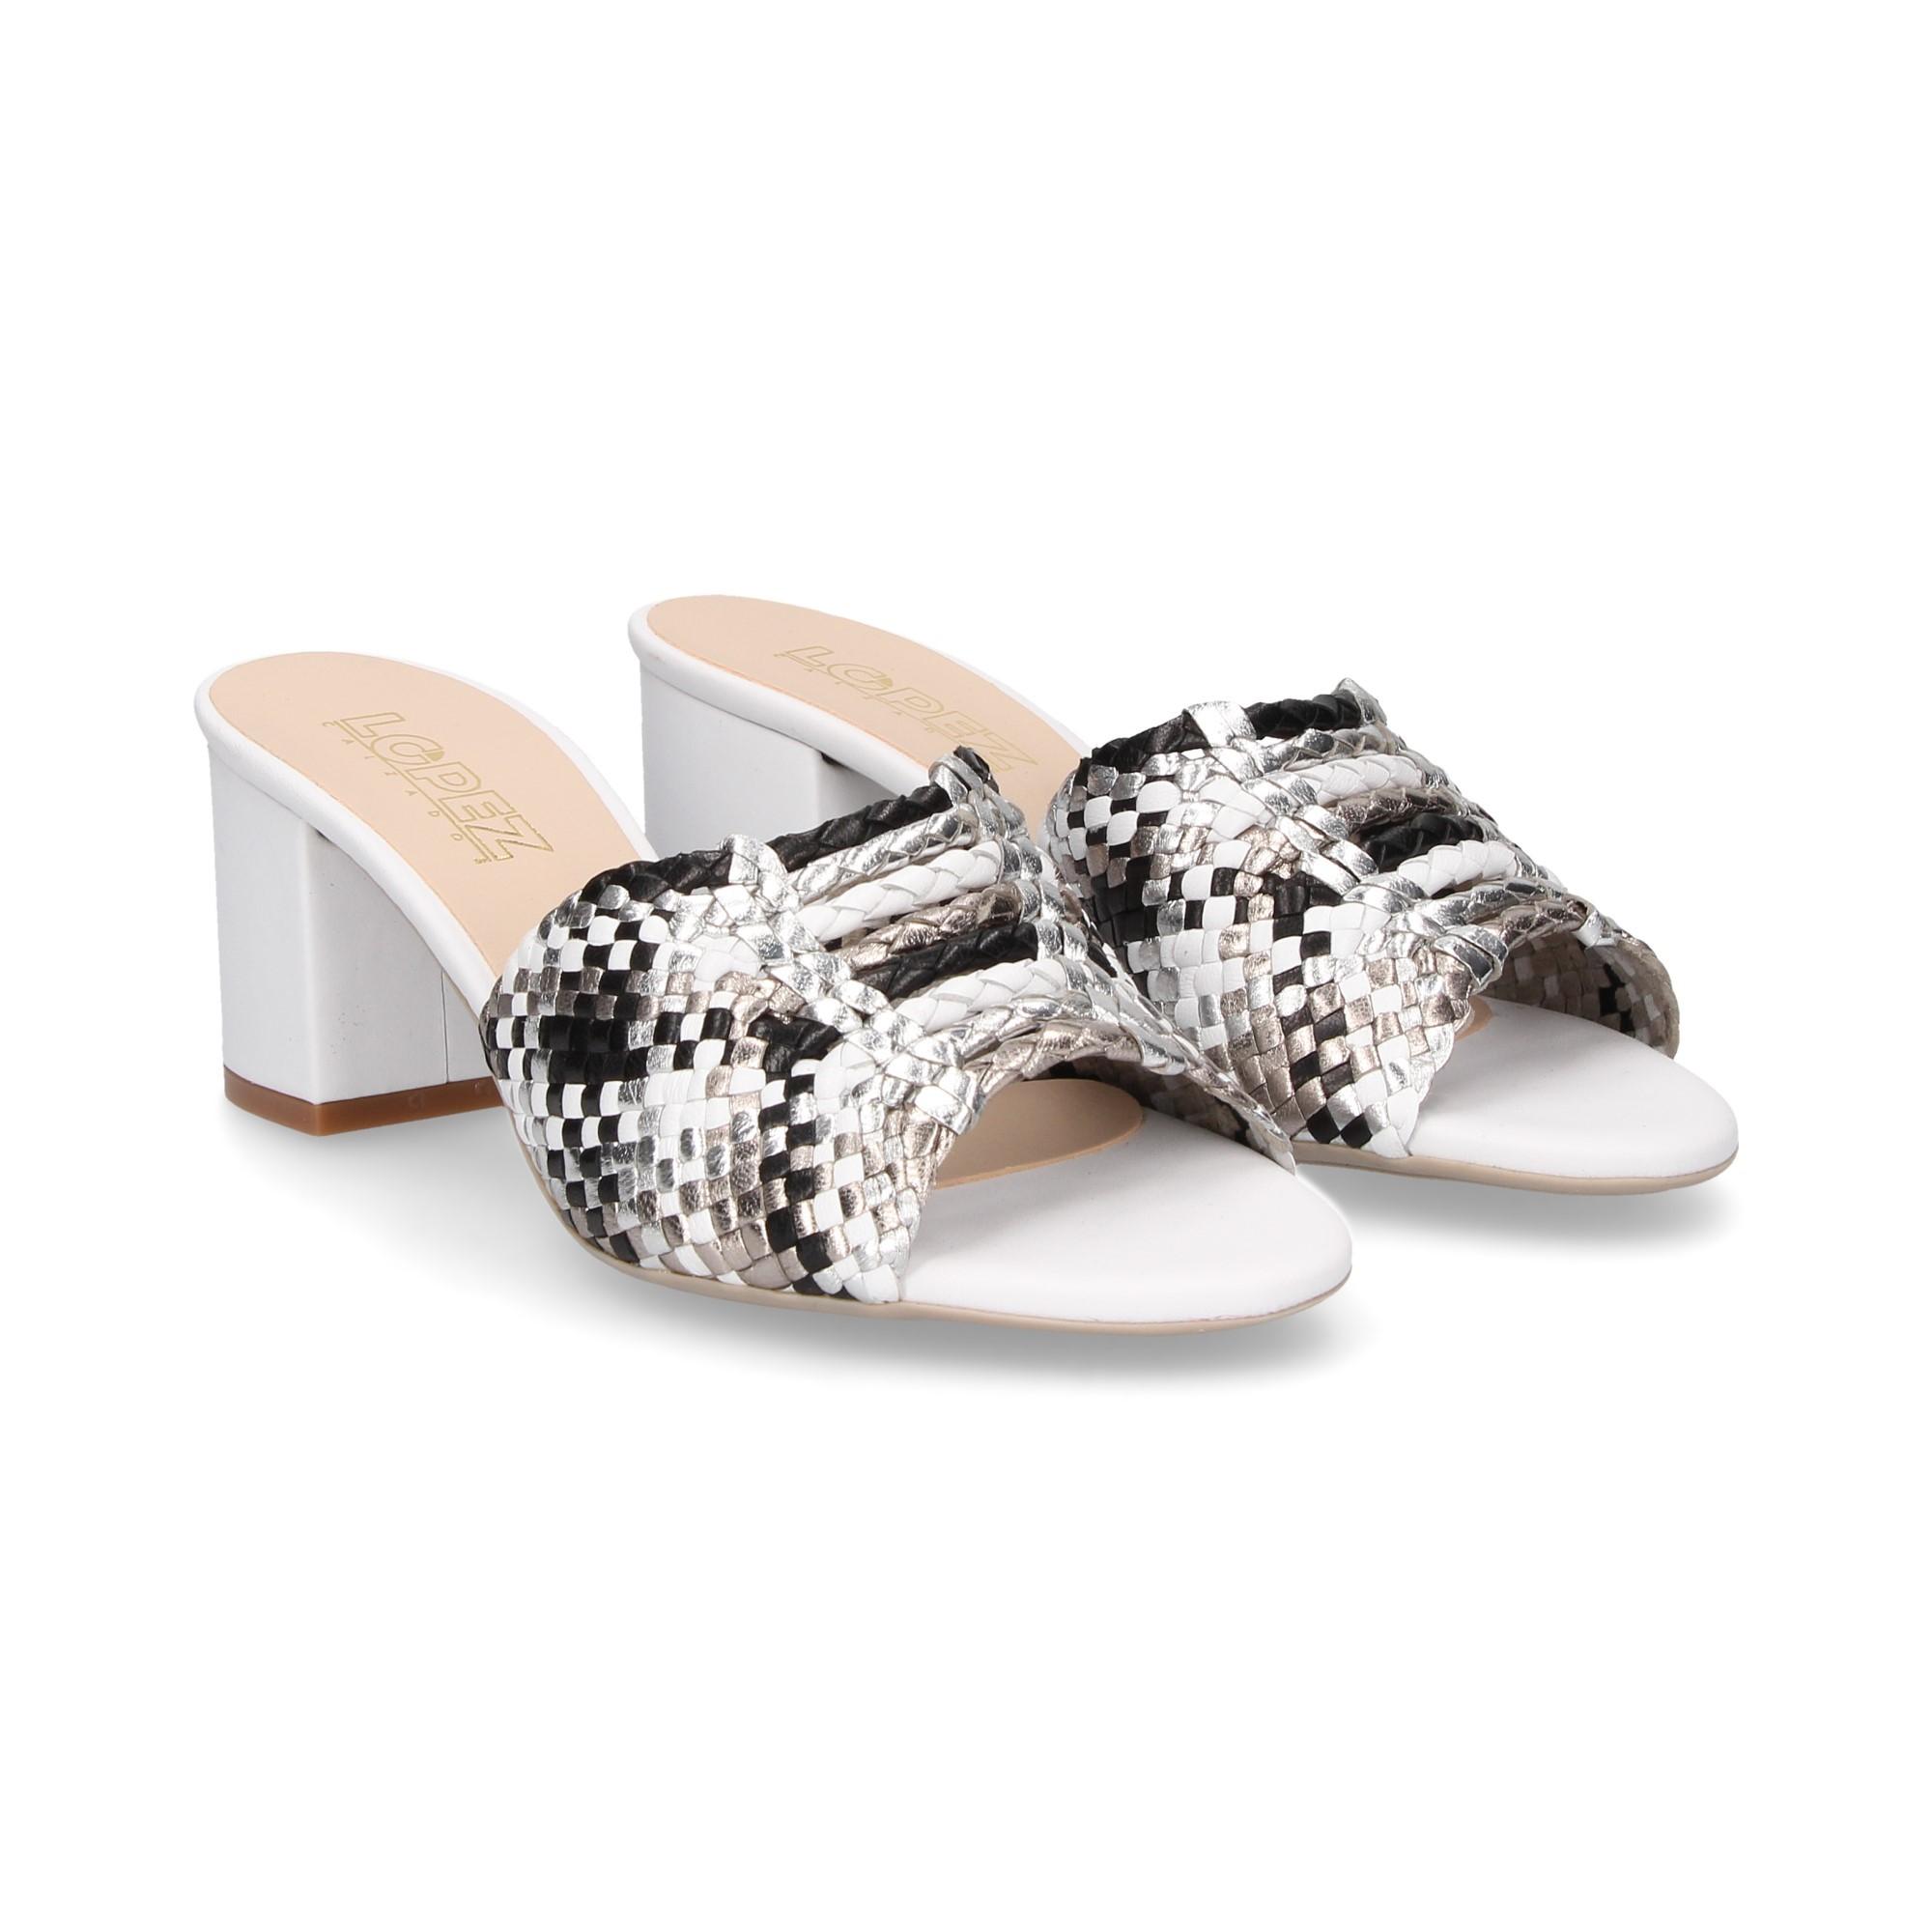 Sandaletten Blanco Kess Frauen Absatz Mit 18261 Multi fg6Yb7y